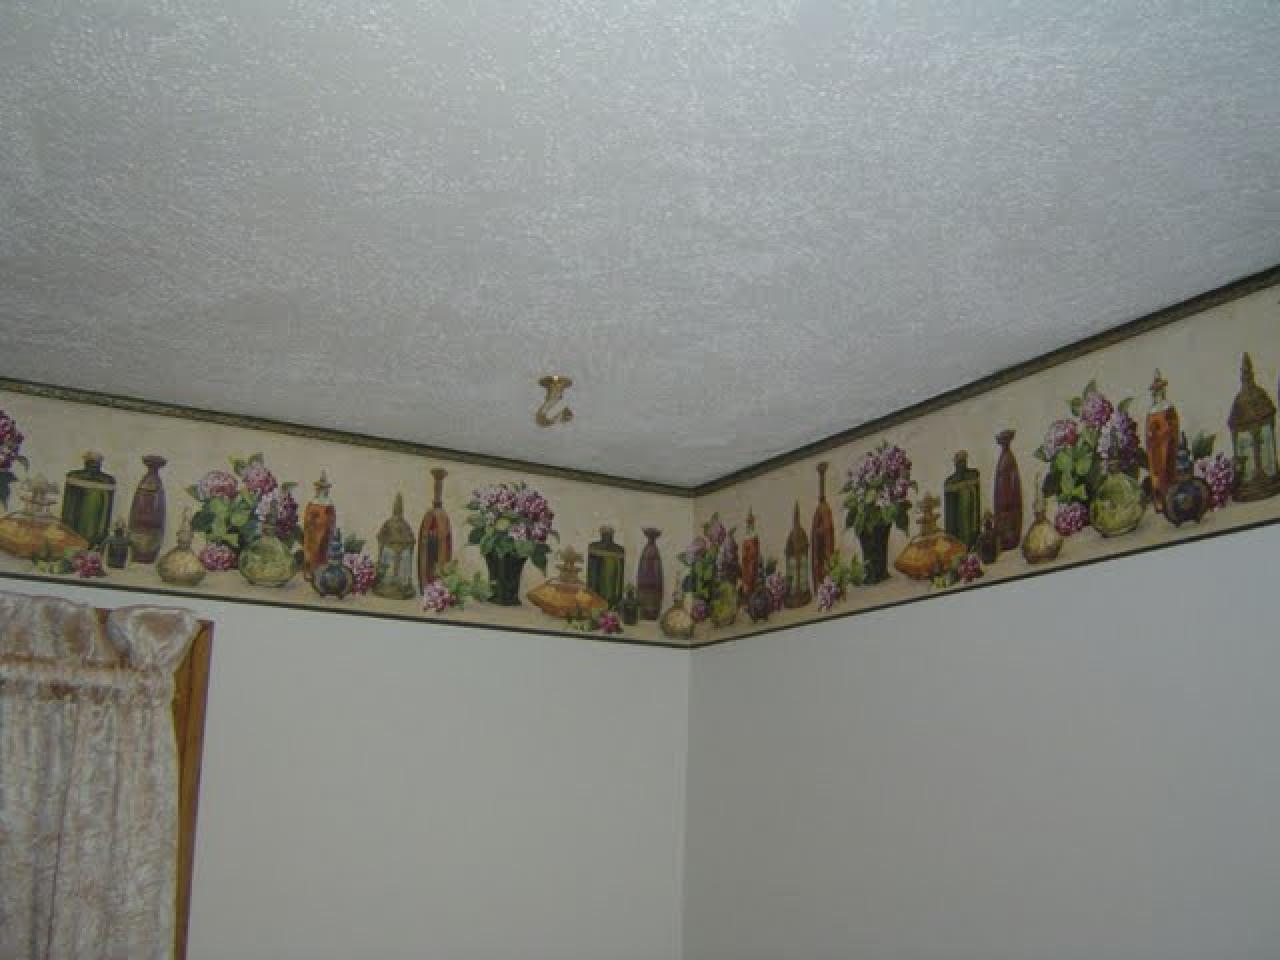 Wallpaper borders for bathrooms bathroom design ideas 1280x960